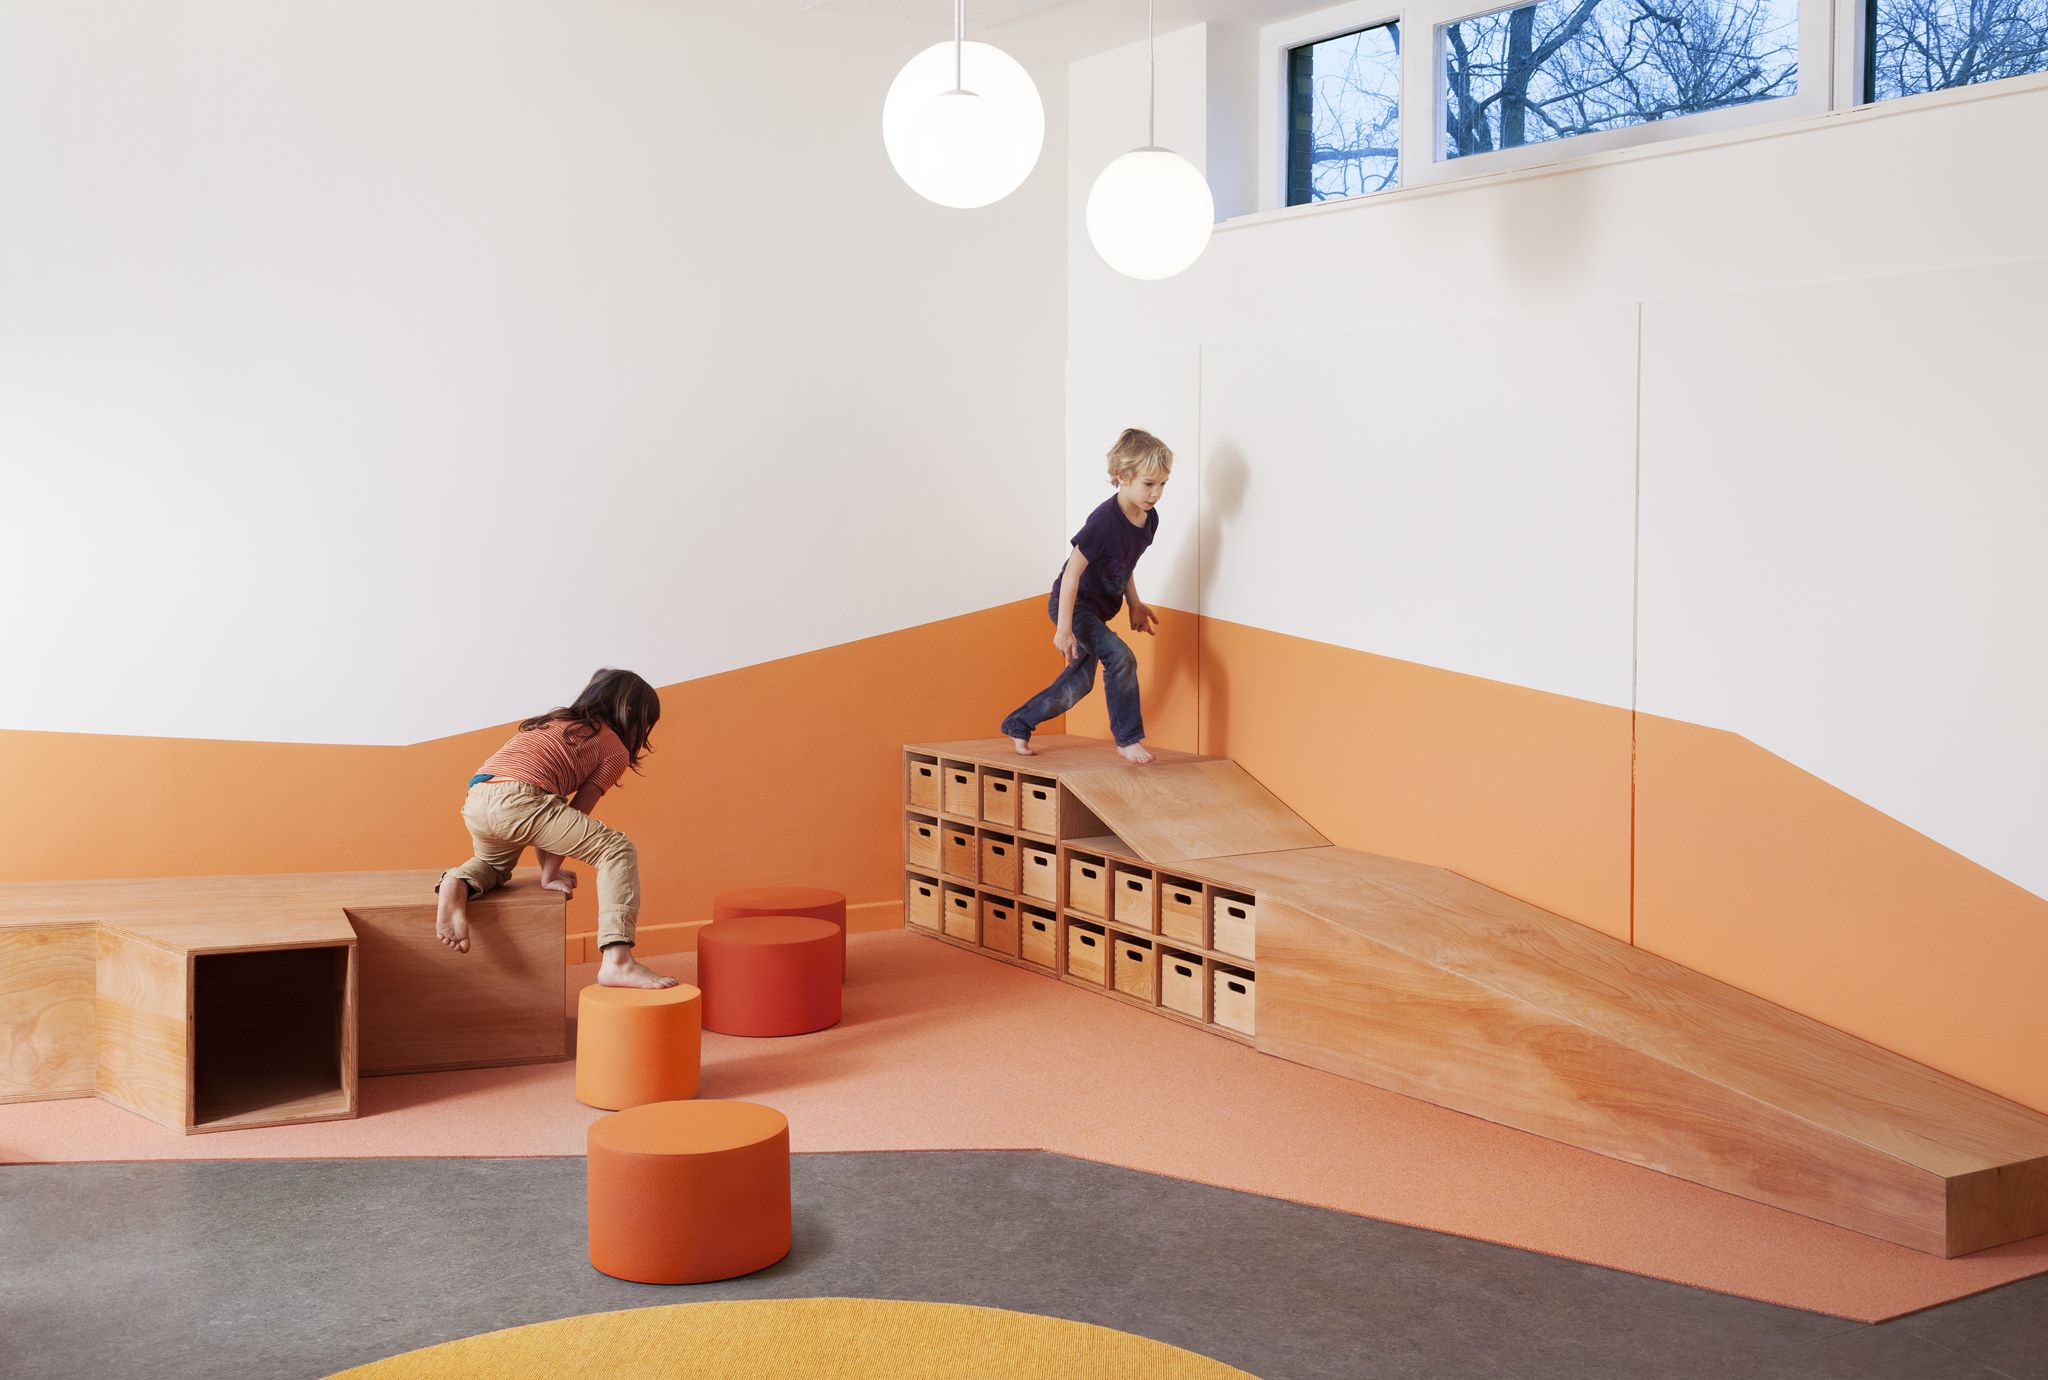 Sinnewandel kindergarten in berlin designed by baukind and for Raumgestaltung atelier kita